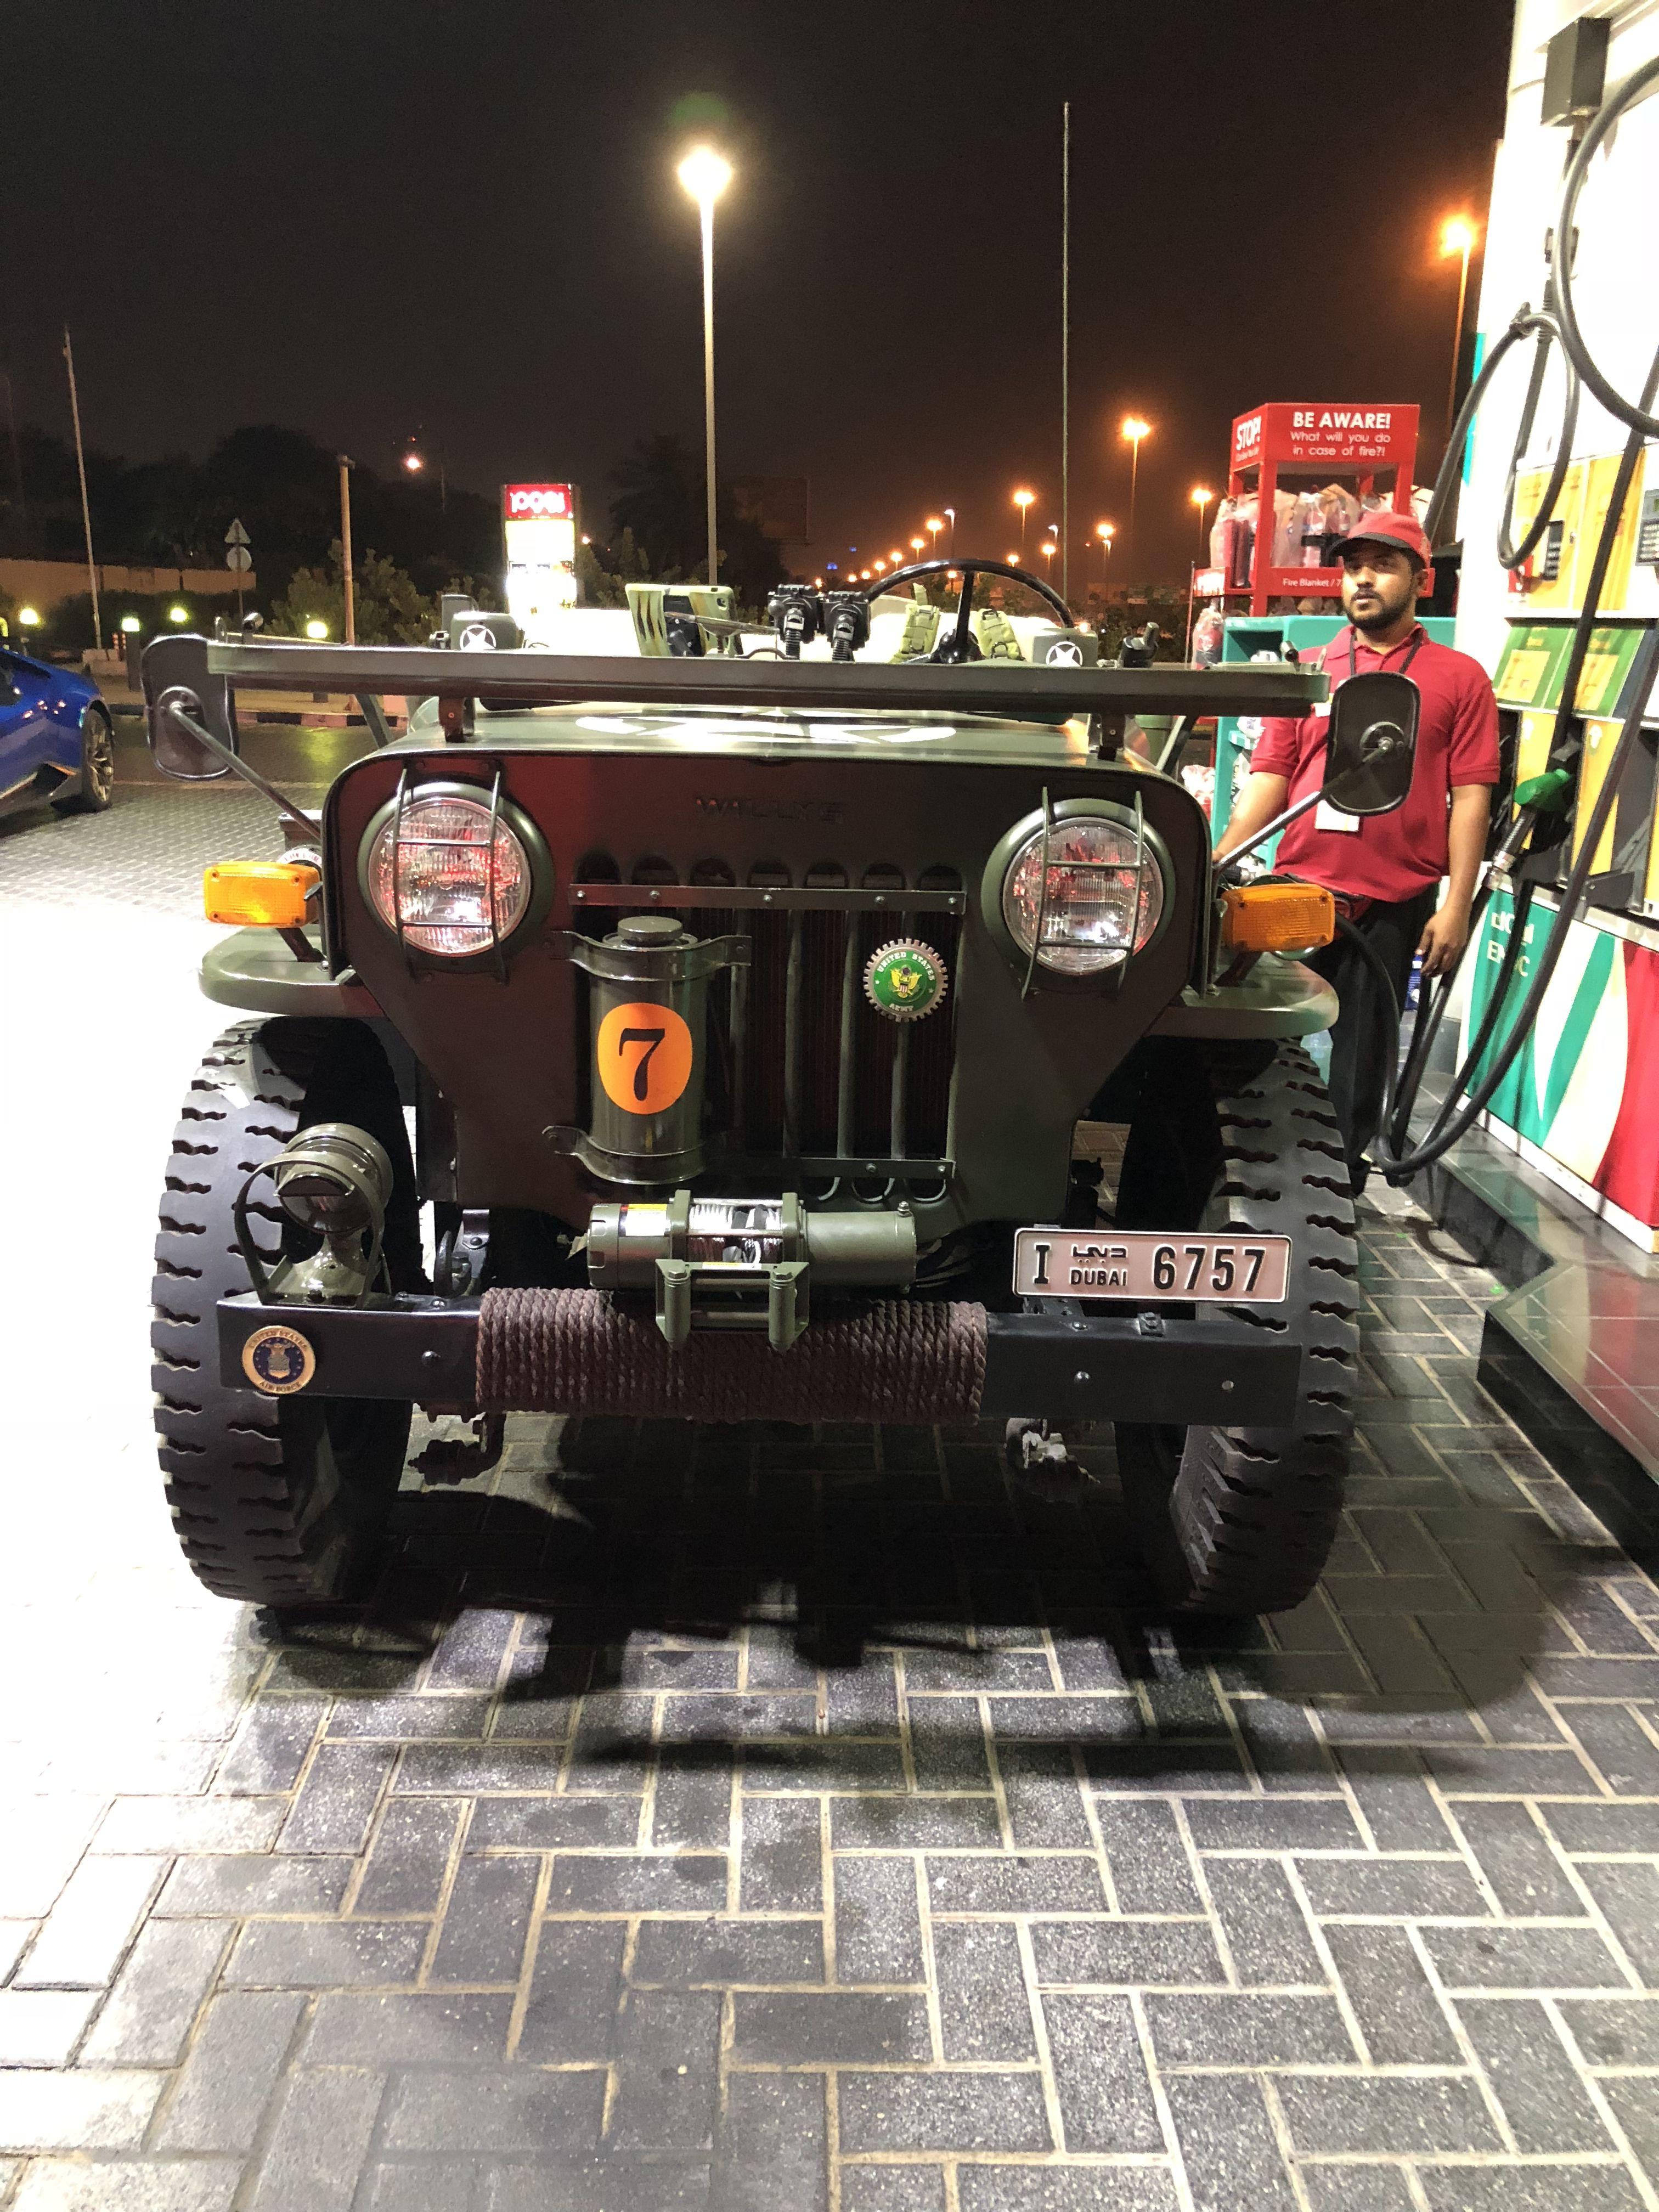 Pin By Willysdubai On Jeep Willys Dubai Willys Military Jeep Willys Jeep